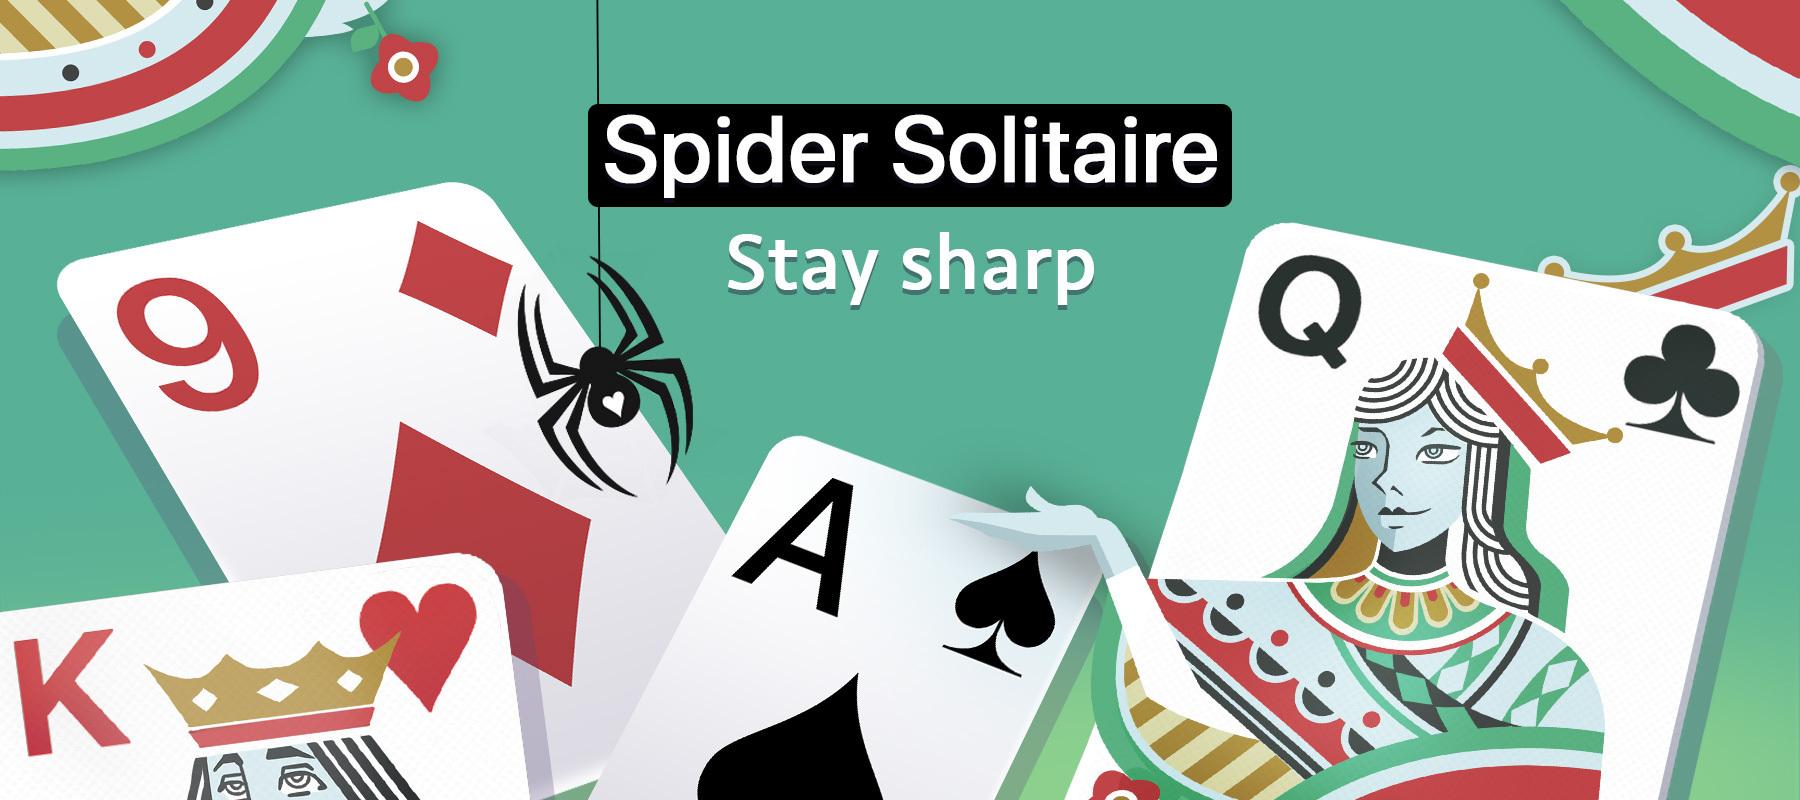 Spider Solitaire Hero Image